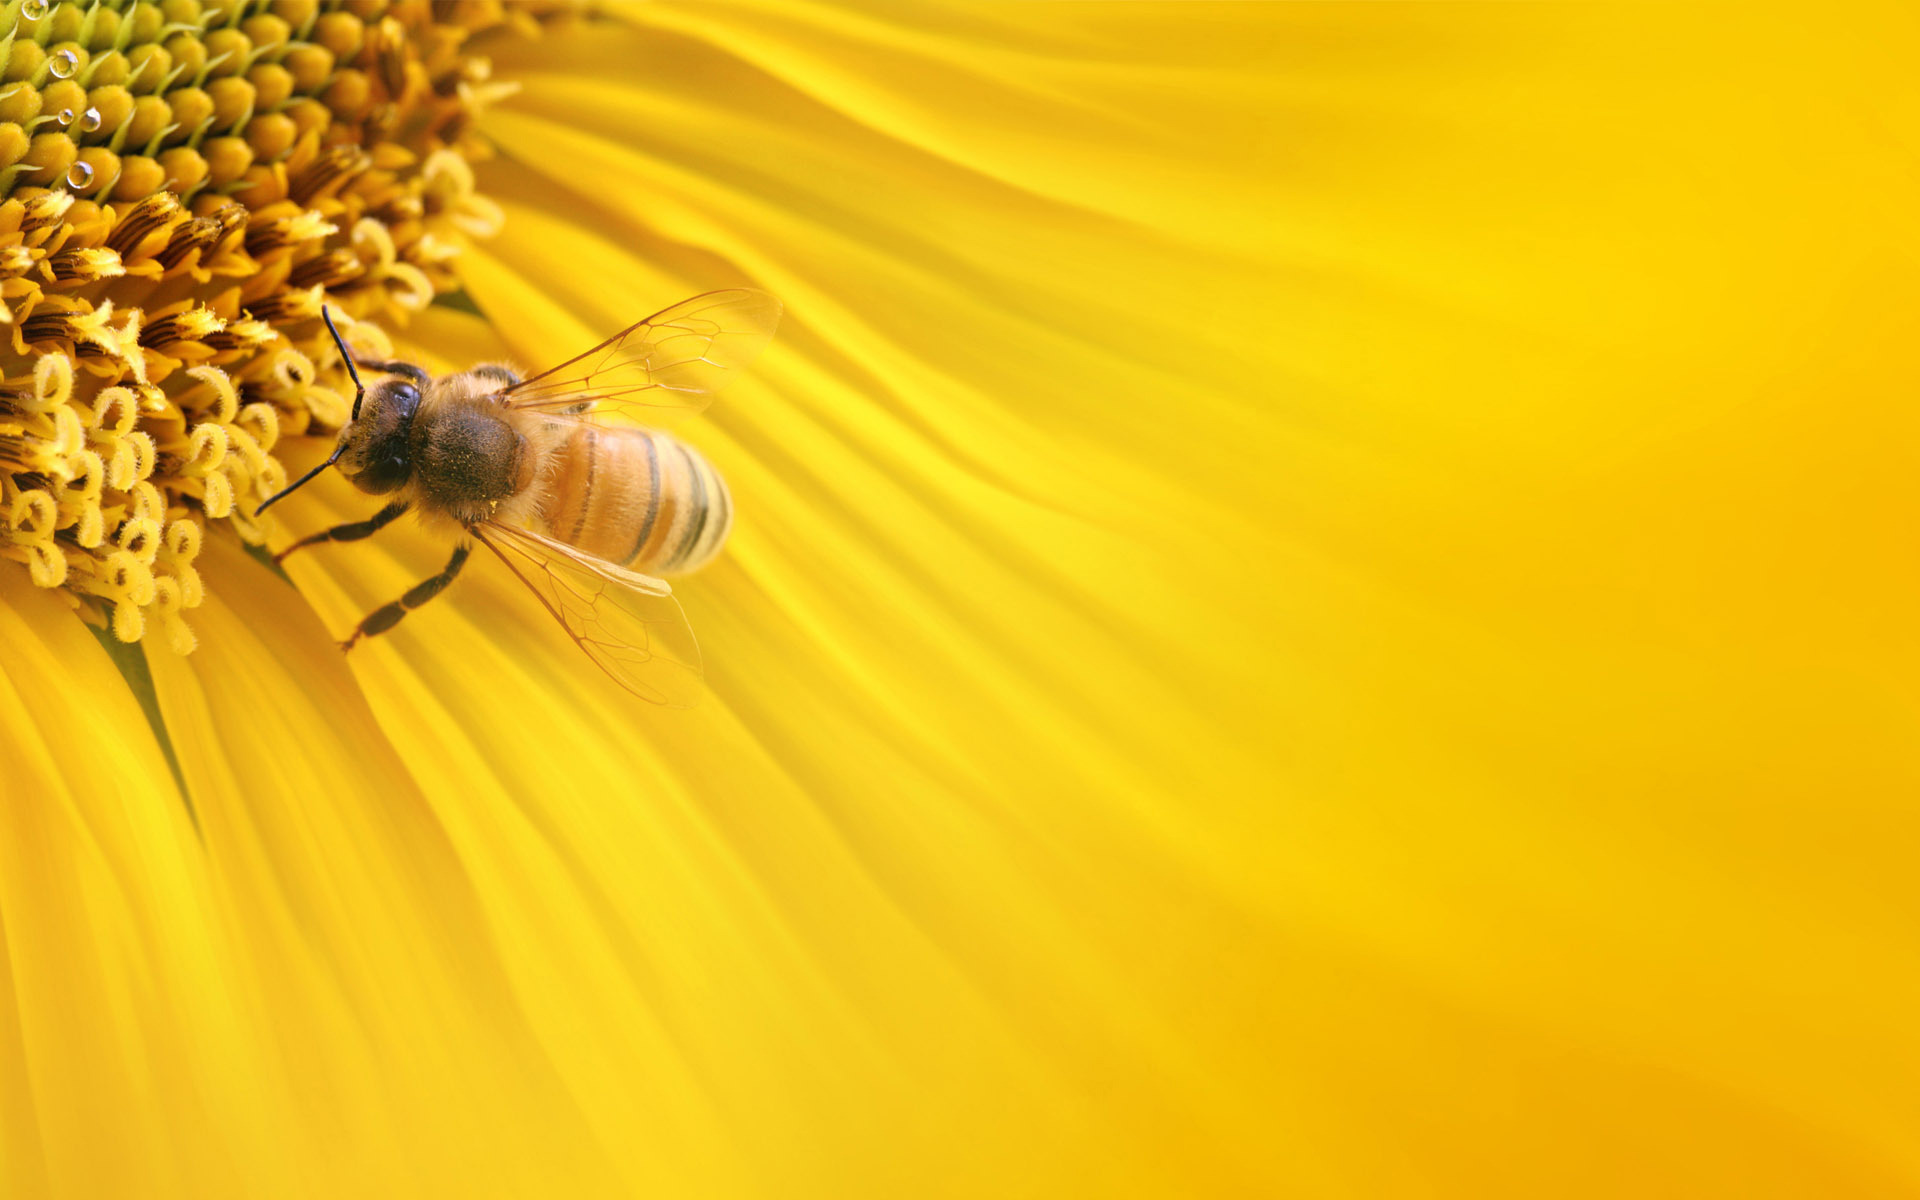 Bee Wallpaper HD